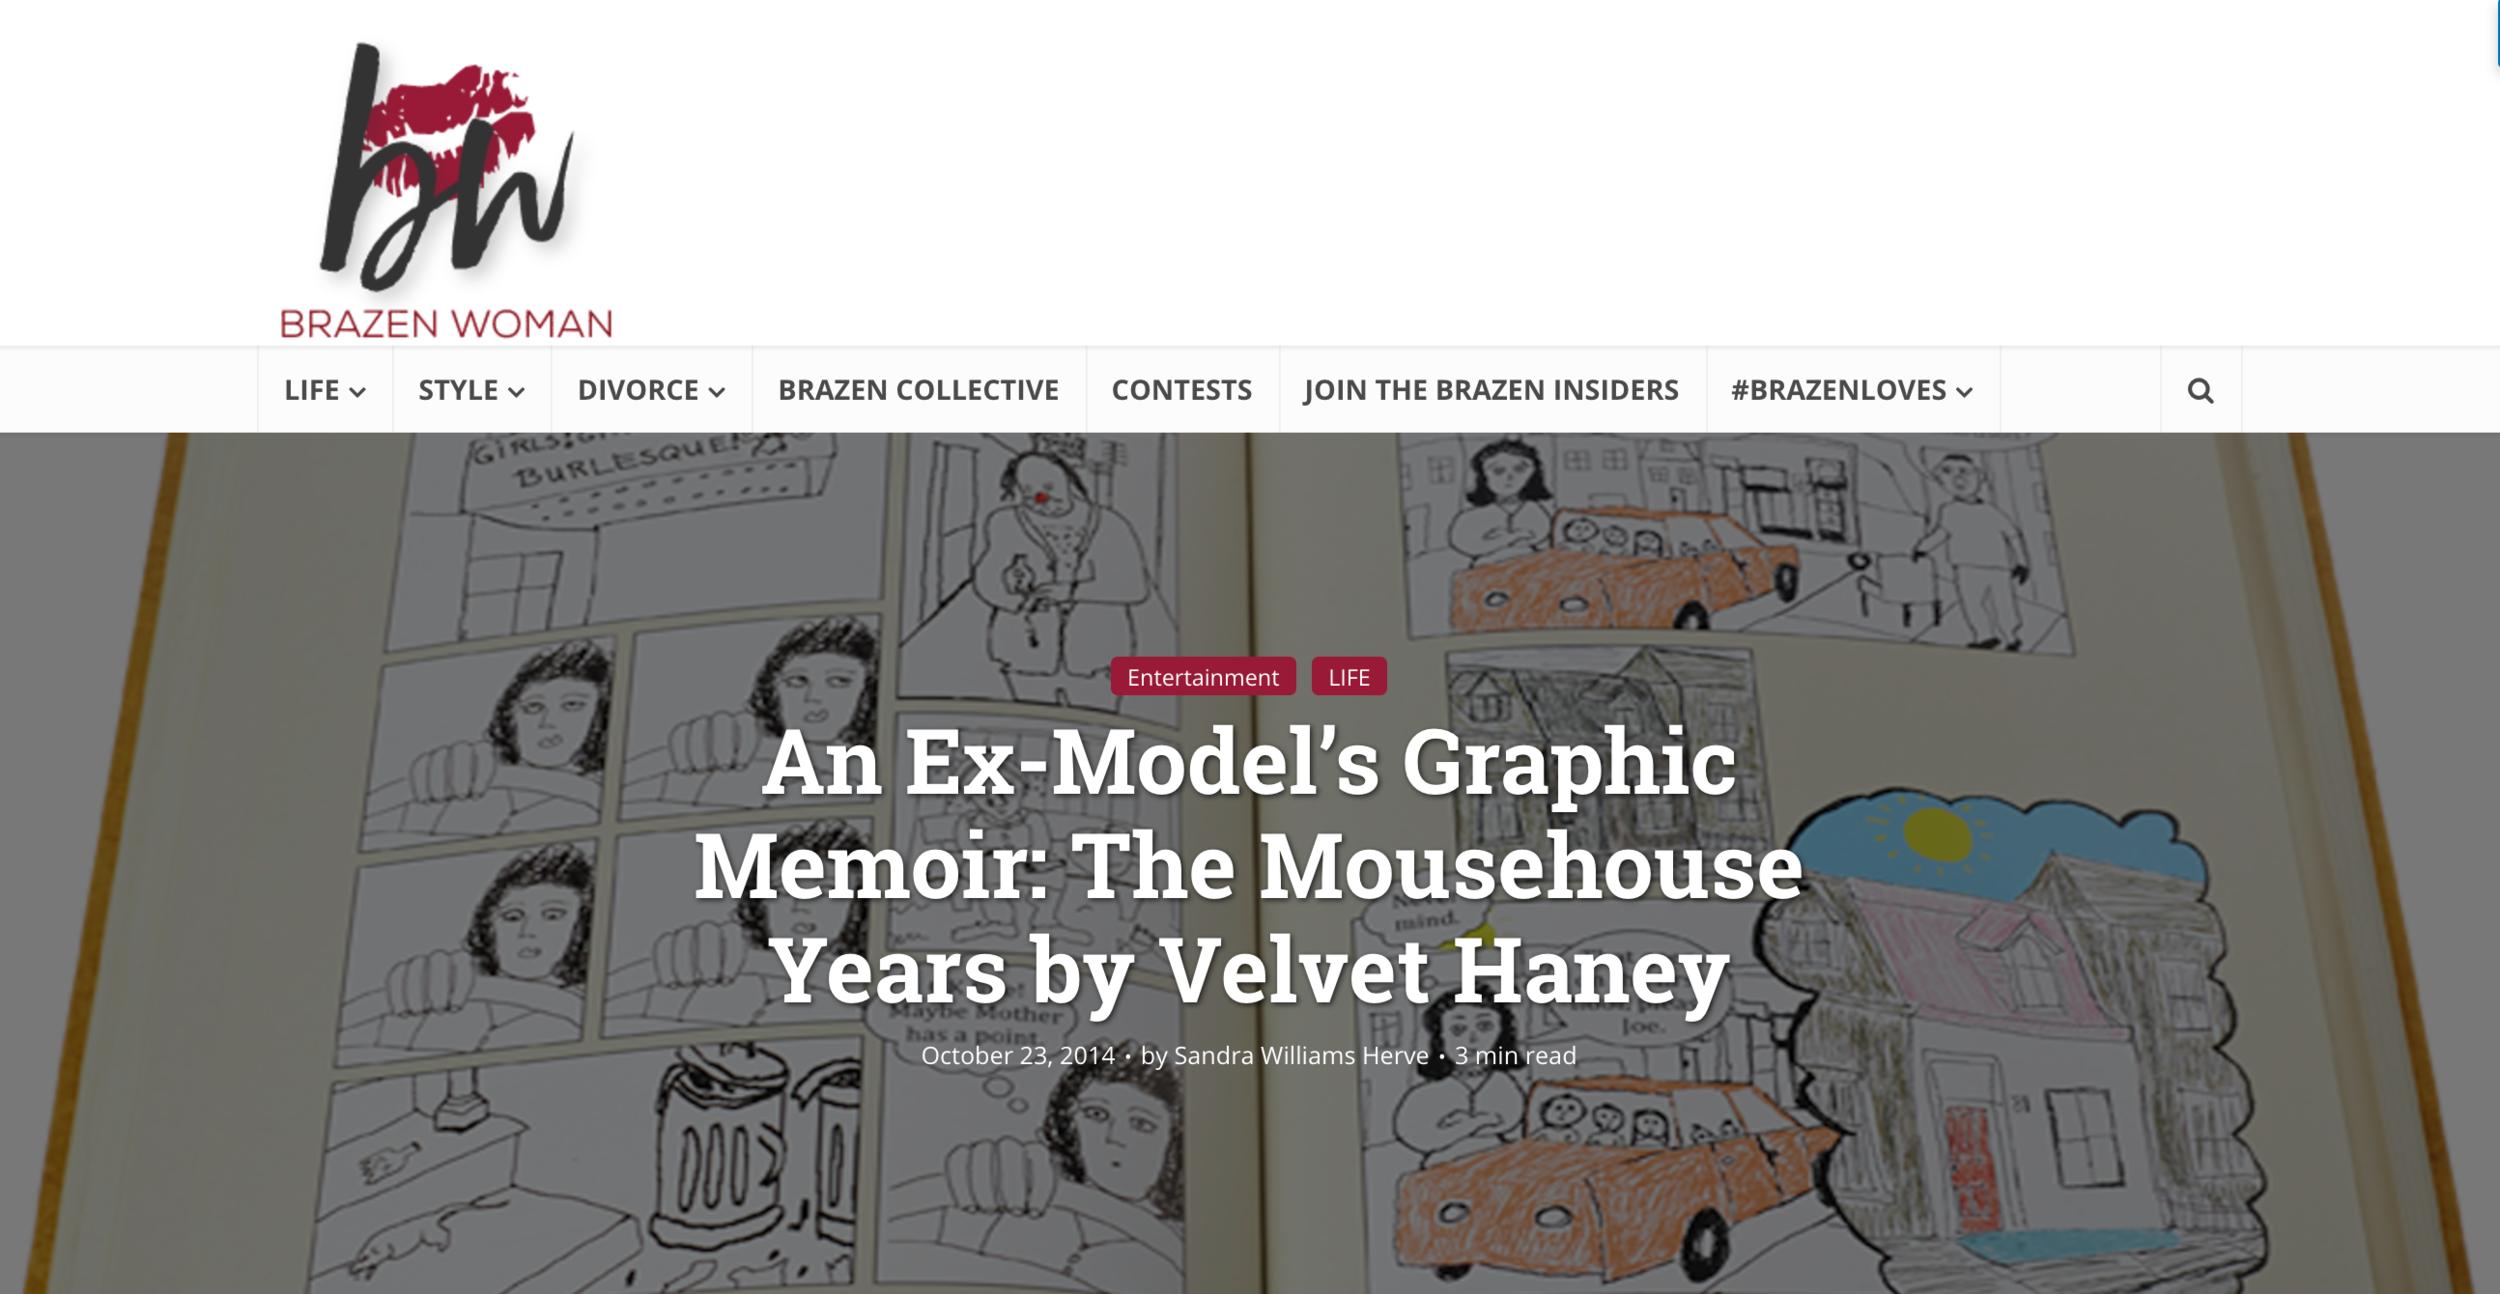 Ex-Model Velvet Haney's Graphic Memoir The Mousehouse Years featured in Brazen Woman